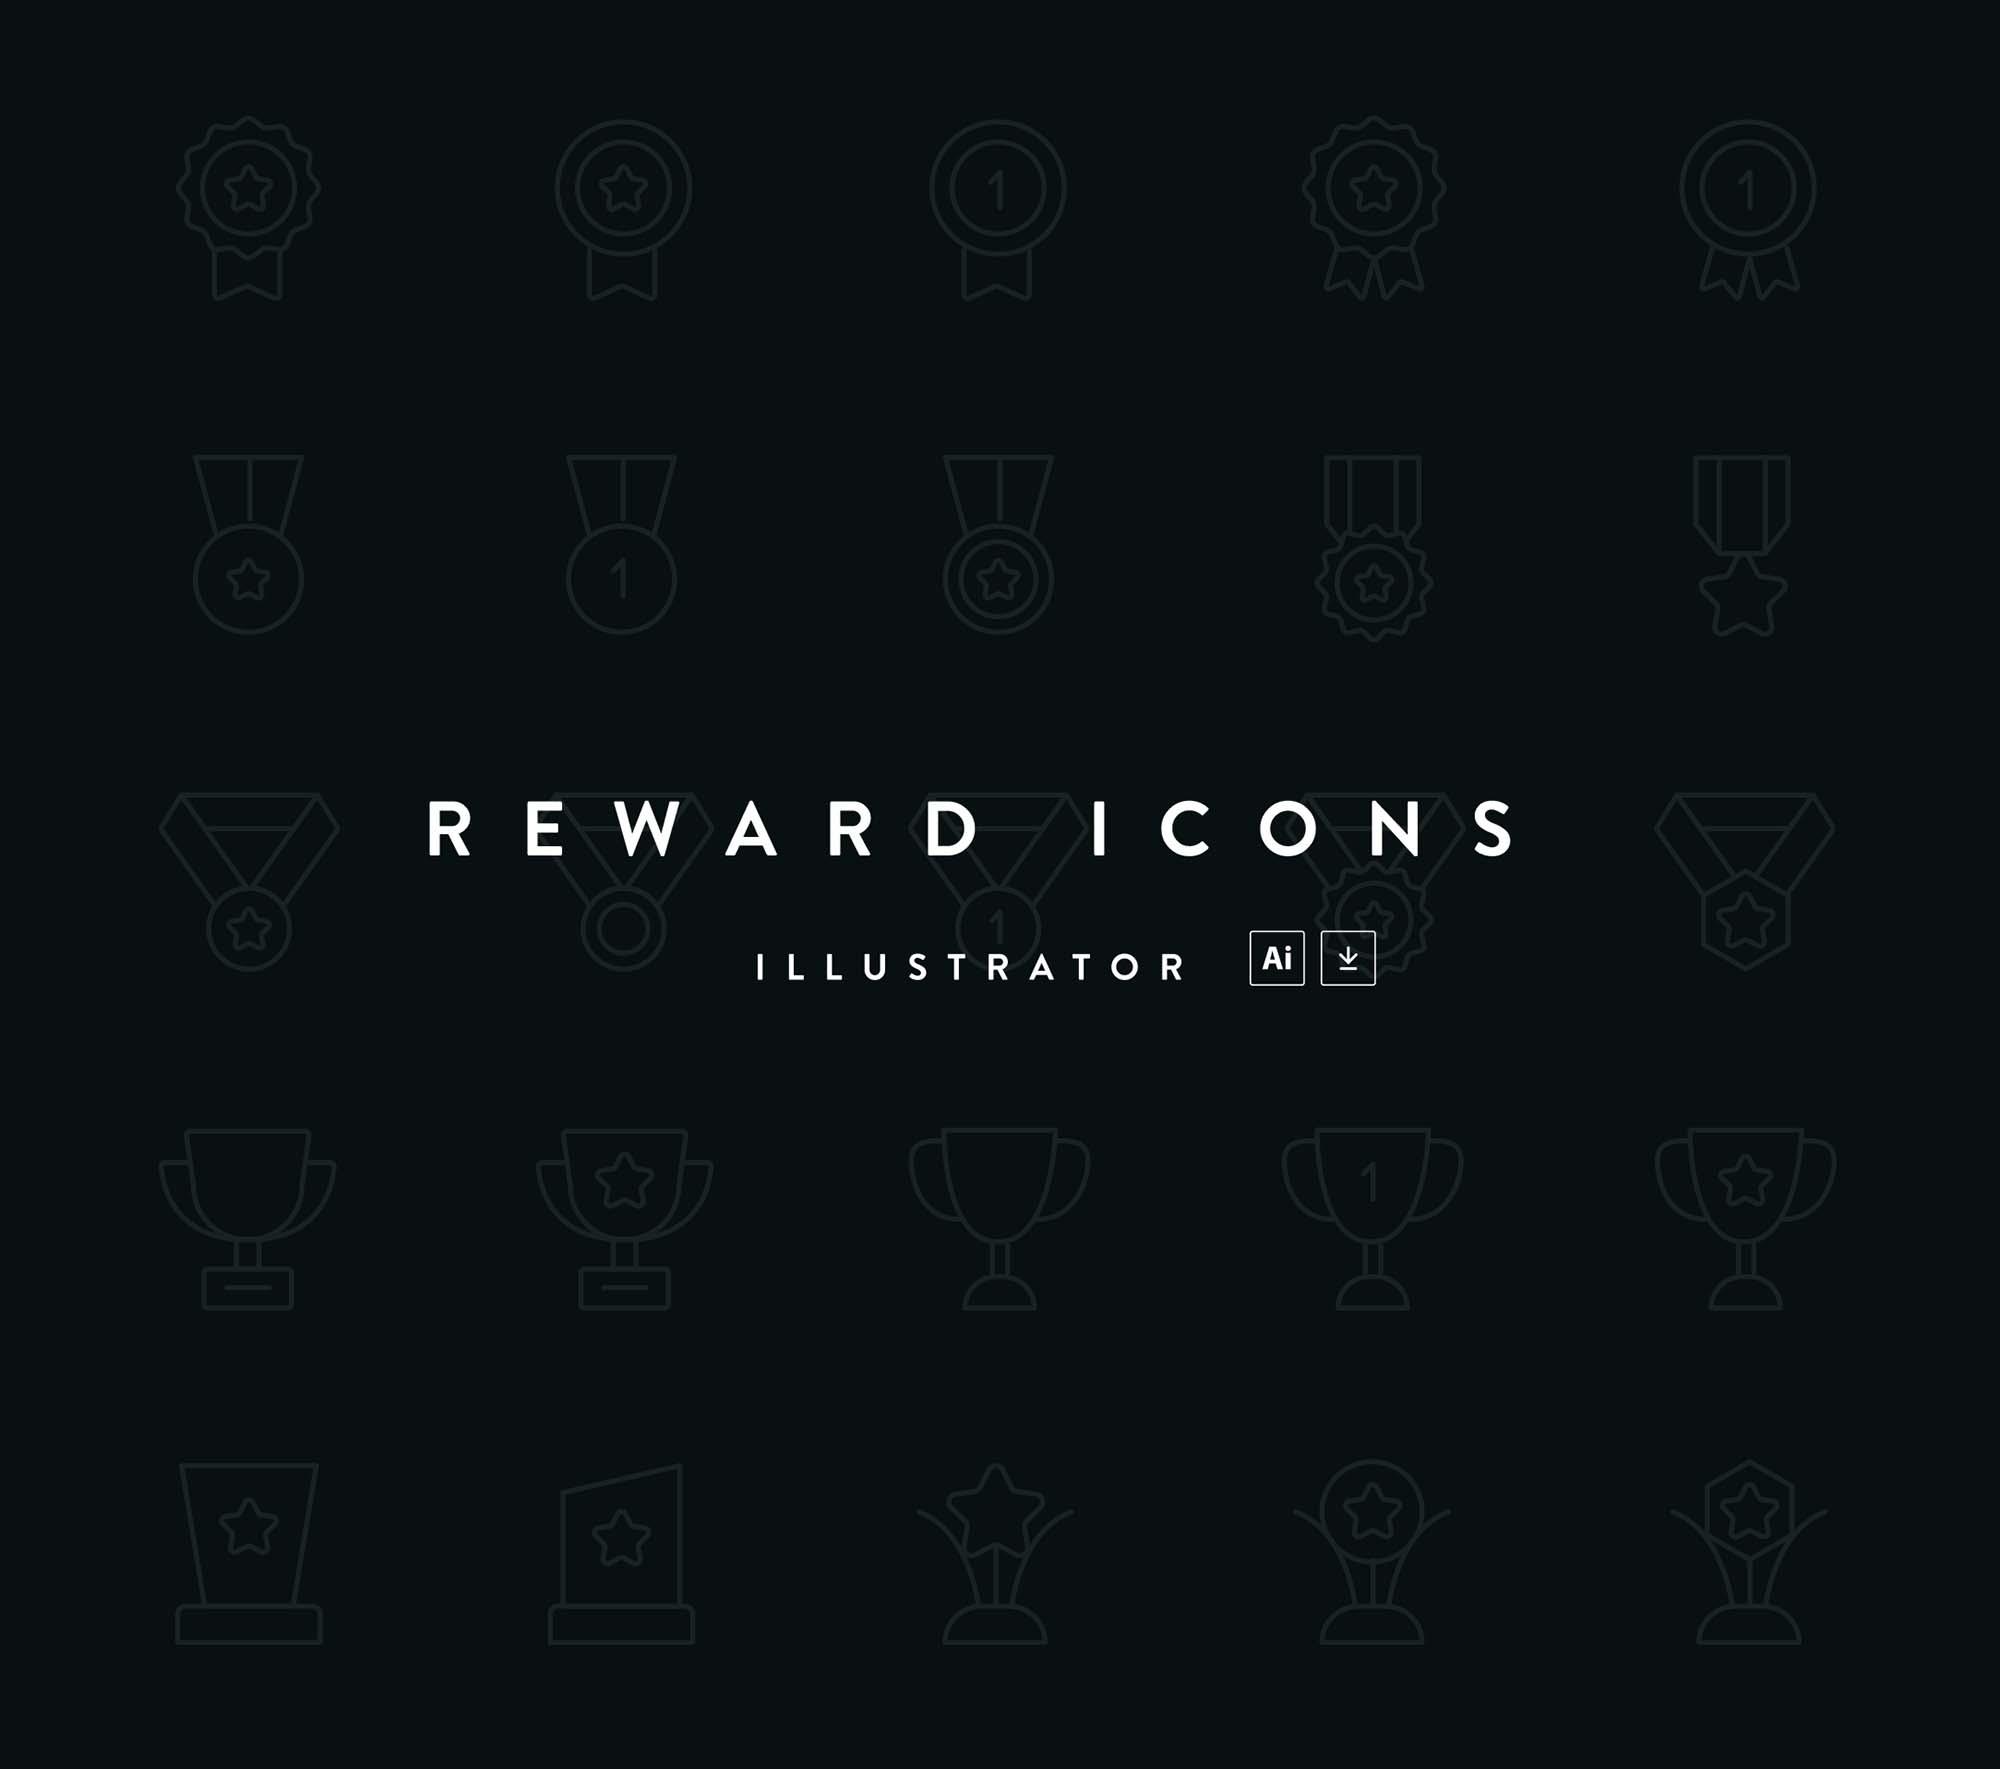 Reward Icons